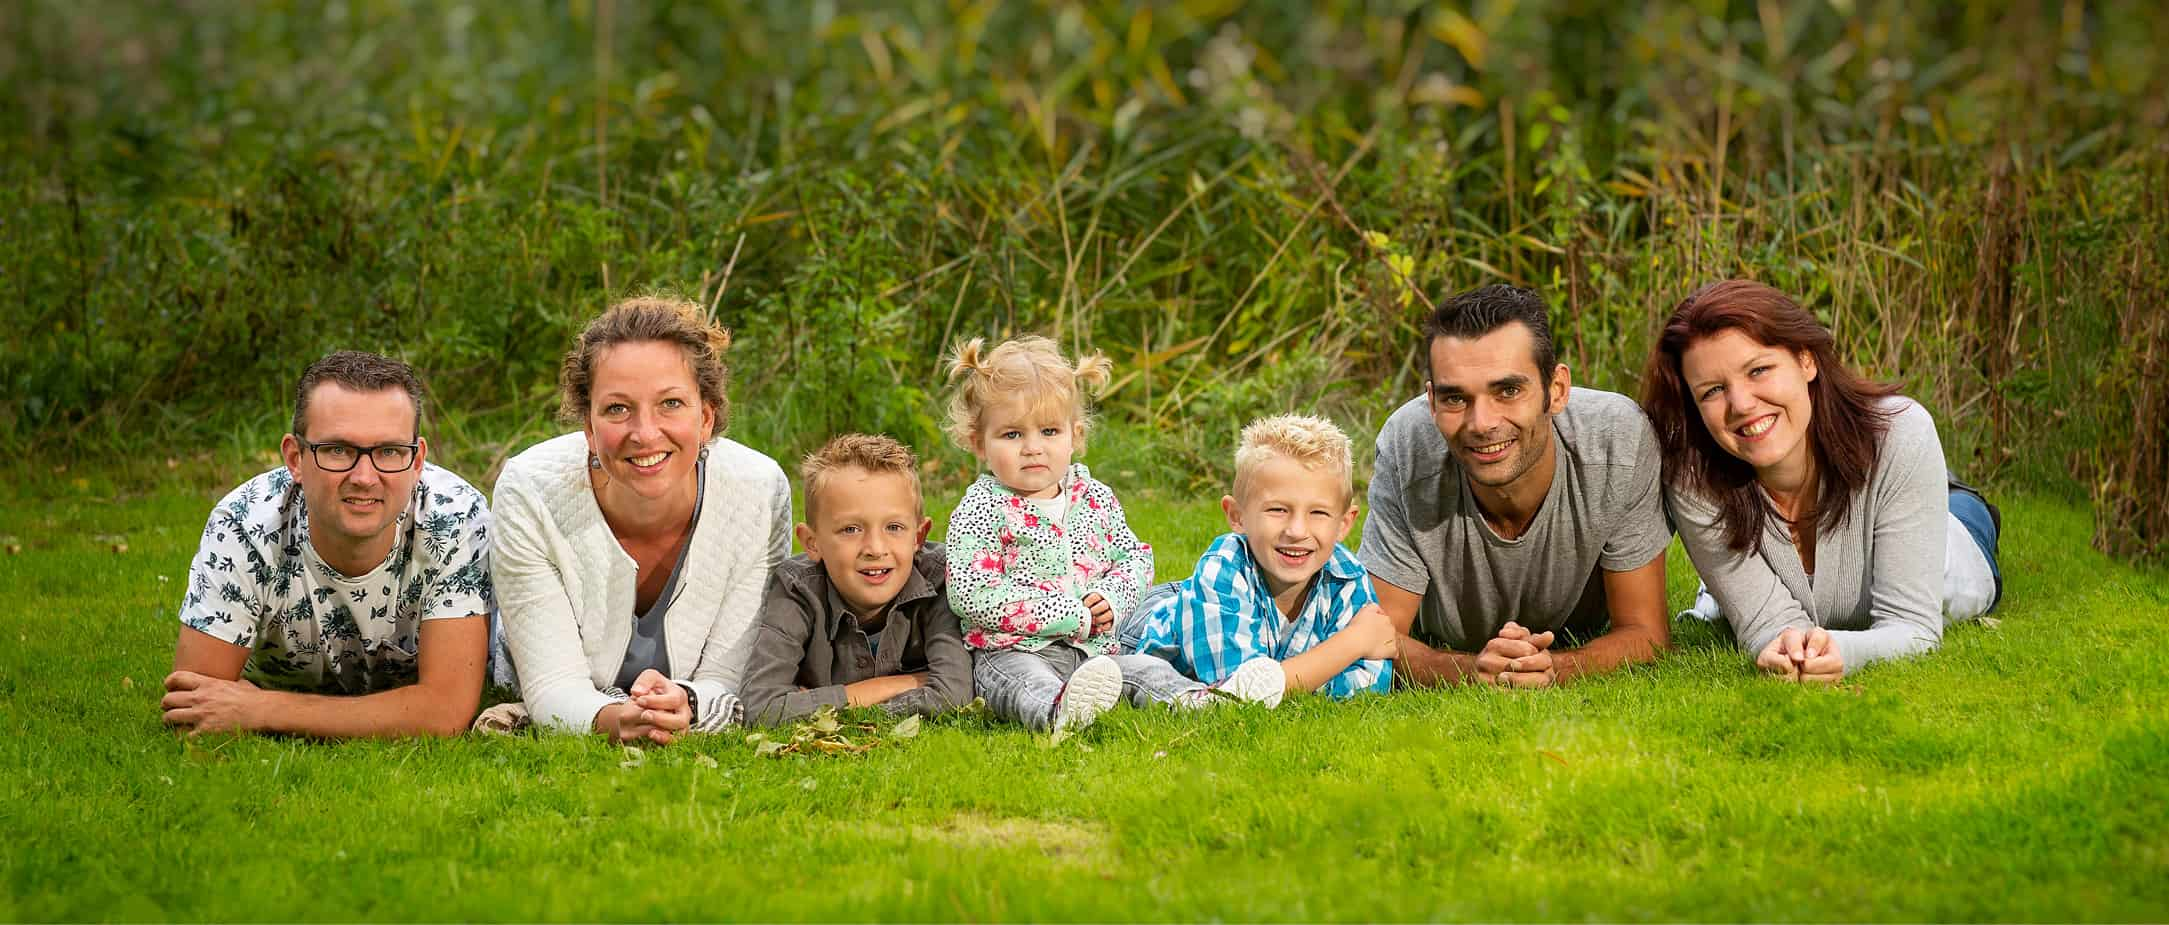 fotograaf familieportret Zuid-Holland